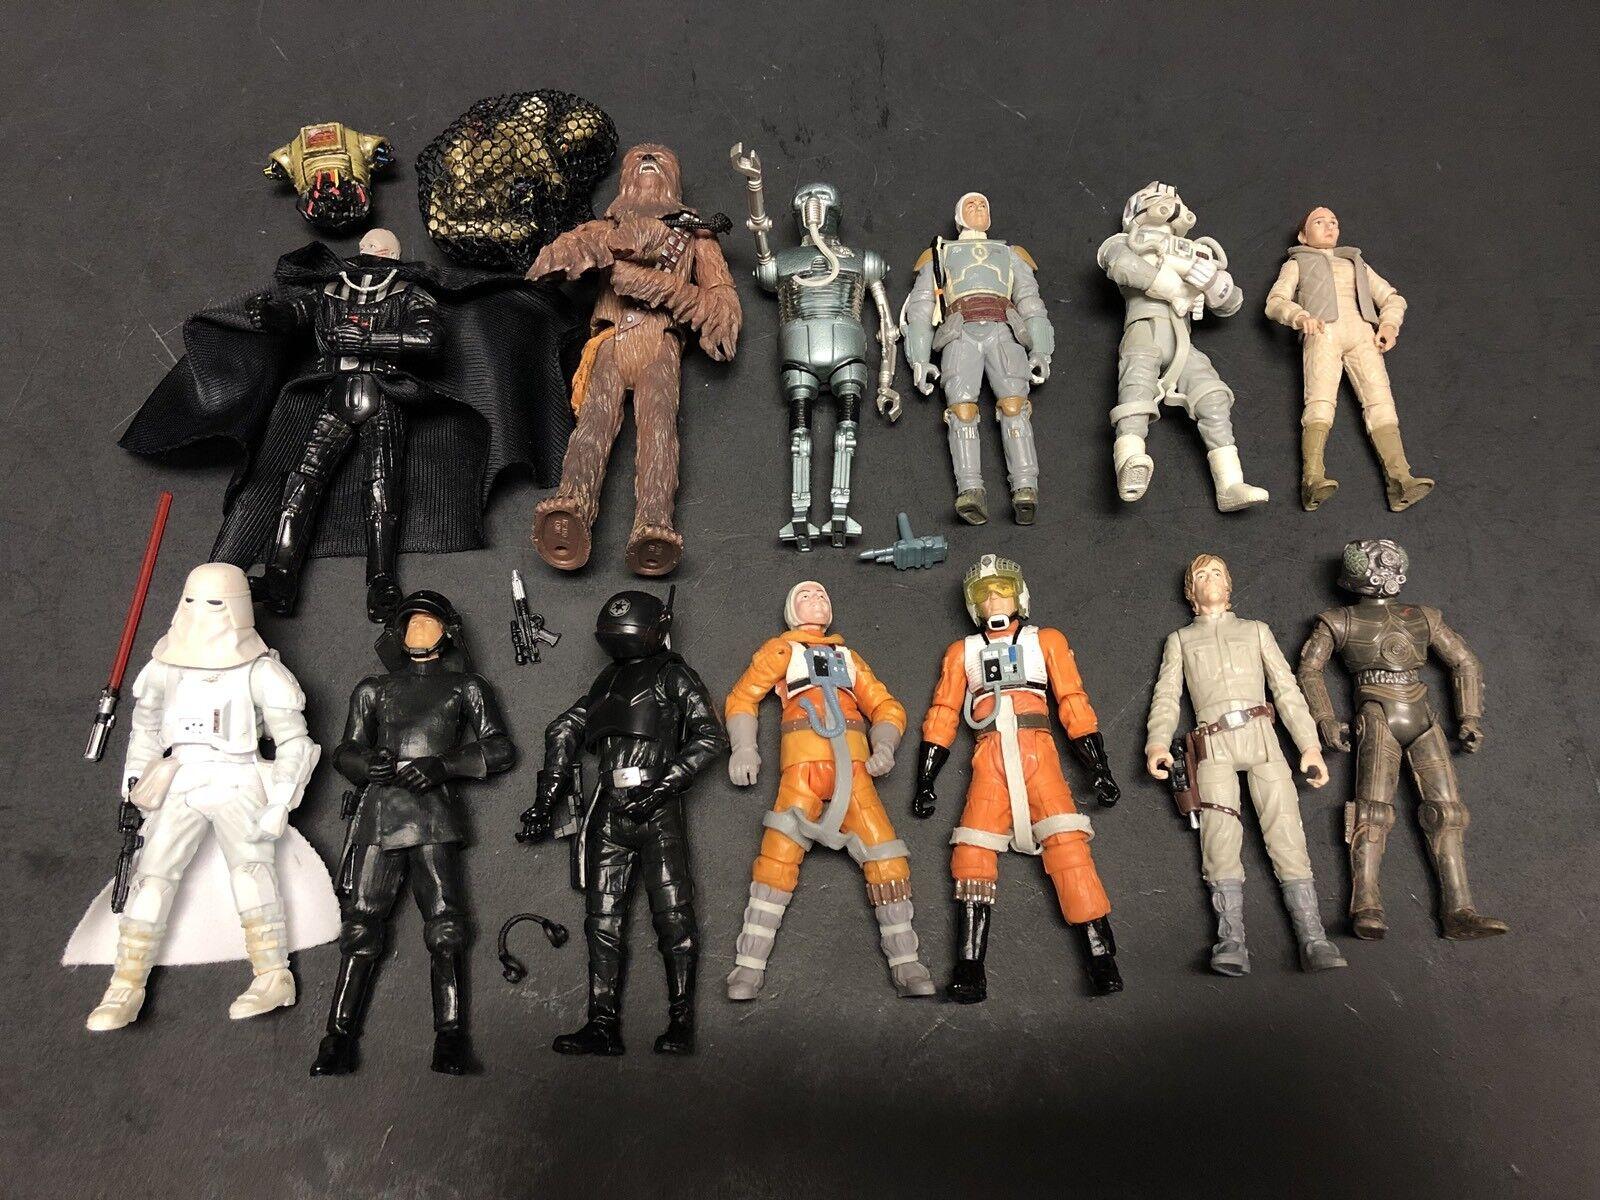 13 Of Lot Chewbacca Luke Pilot Vader ESB Wars Star 3 75